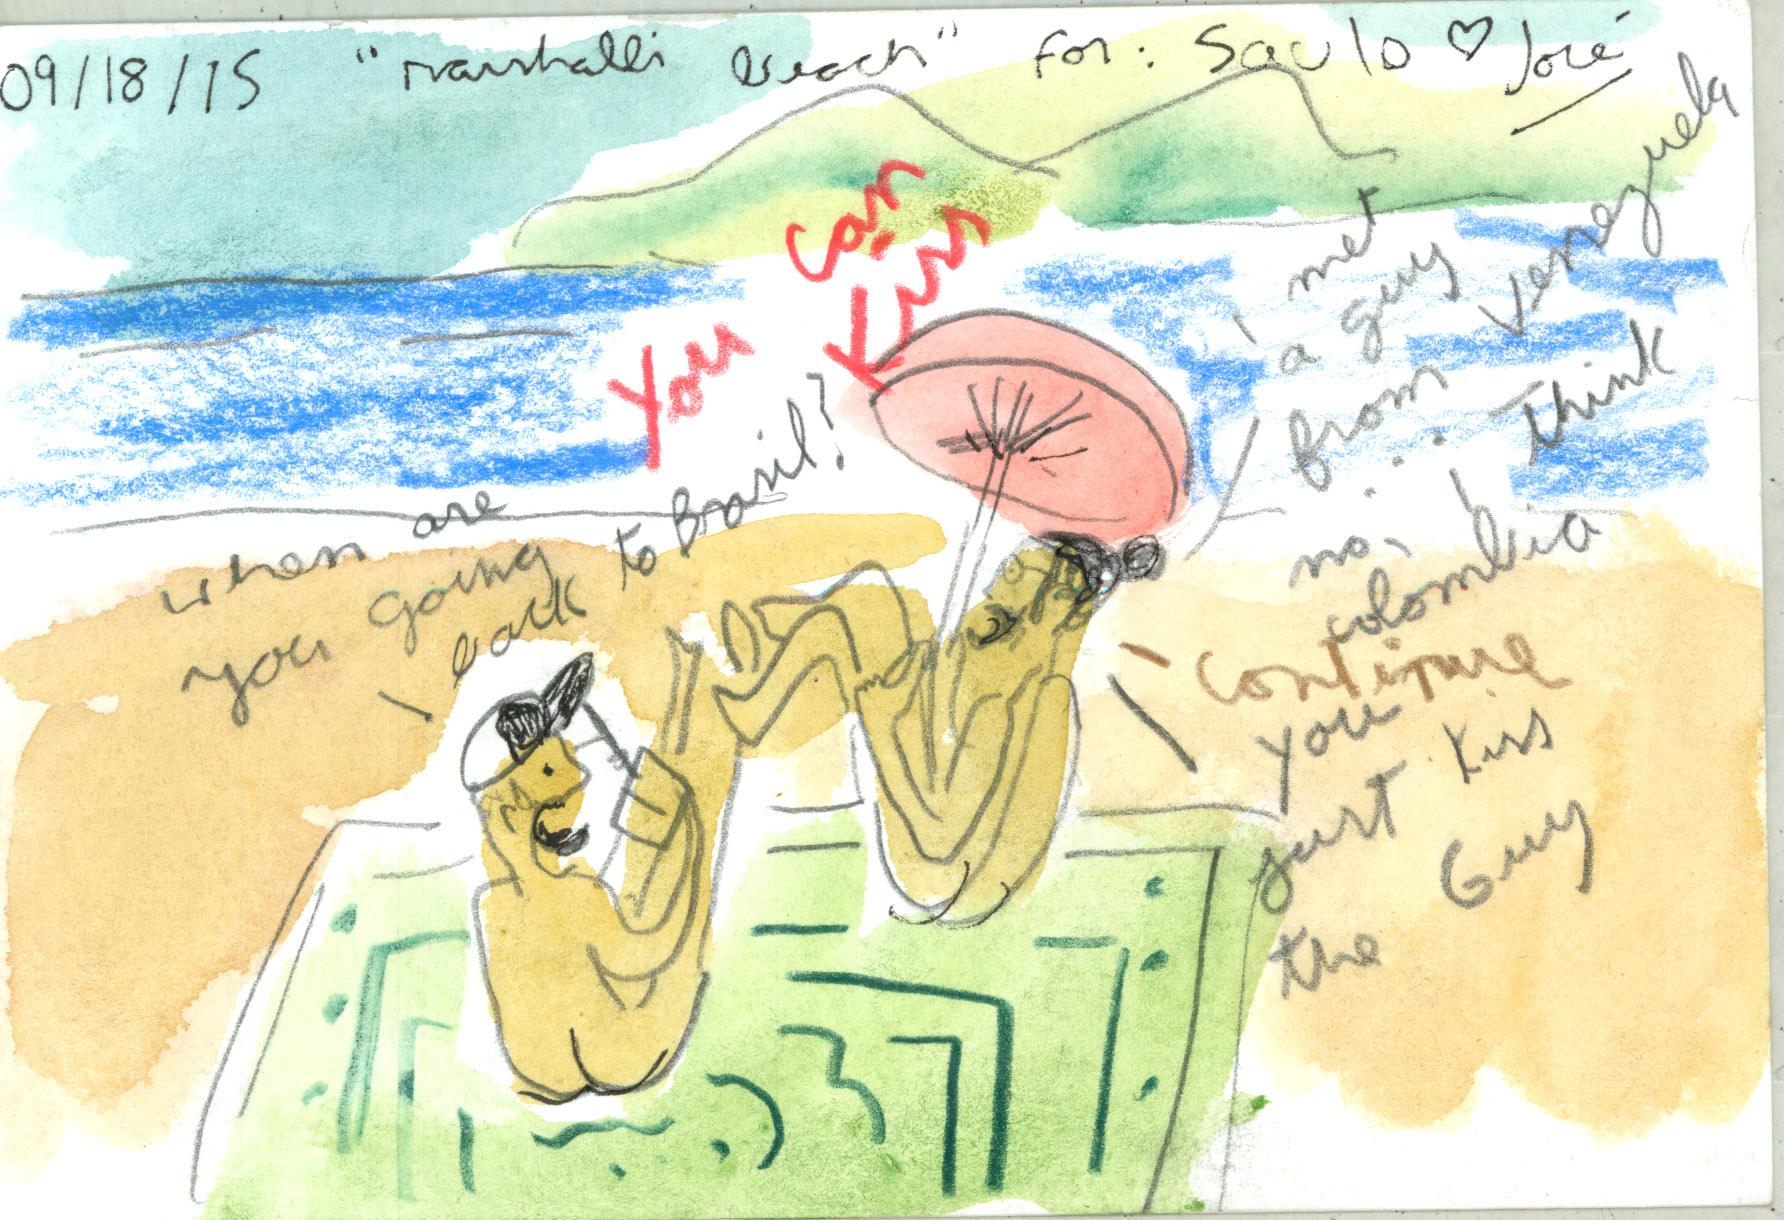 09-18-15 _Marshalls beach for Saulo_